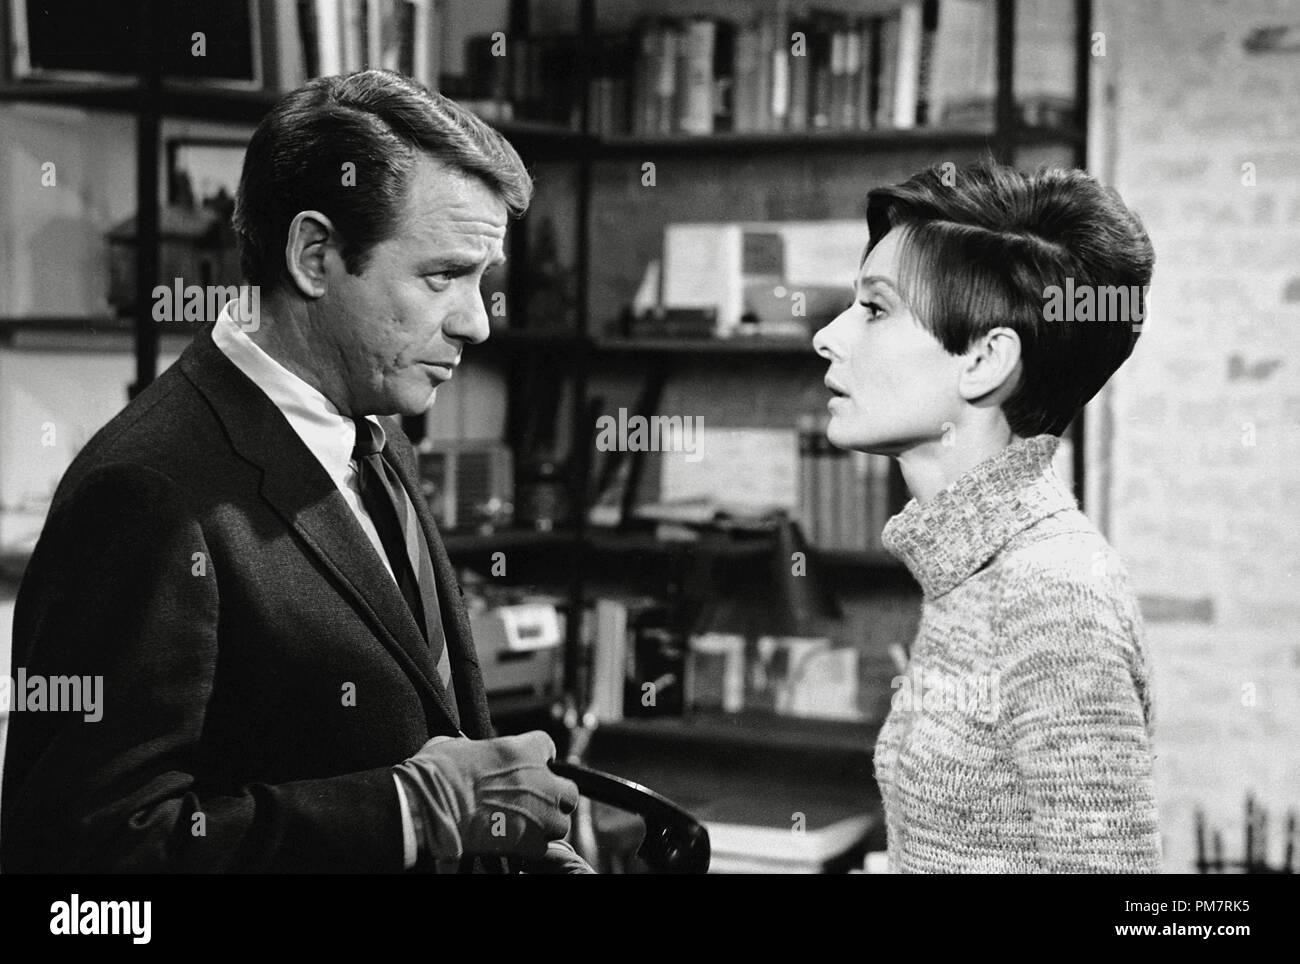 Richard Crenna and Audrey Hepburn, 'Wait Until Dark' 1967 Warner File Reference # 31386_395THA - Stock Image